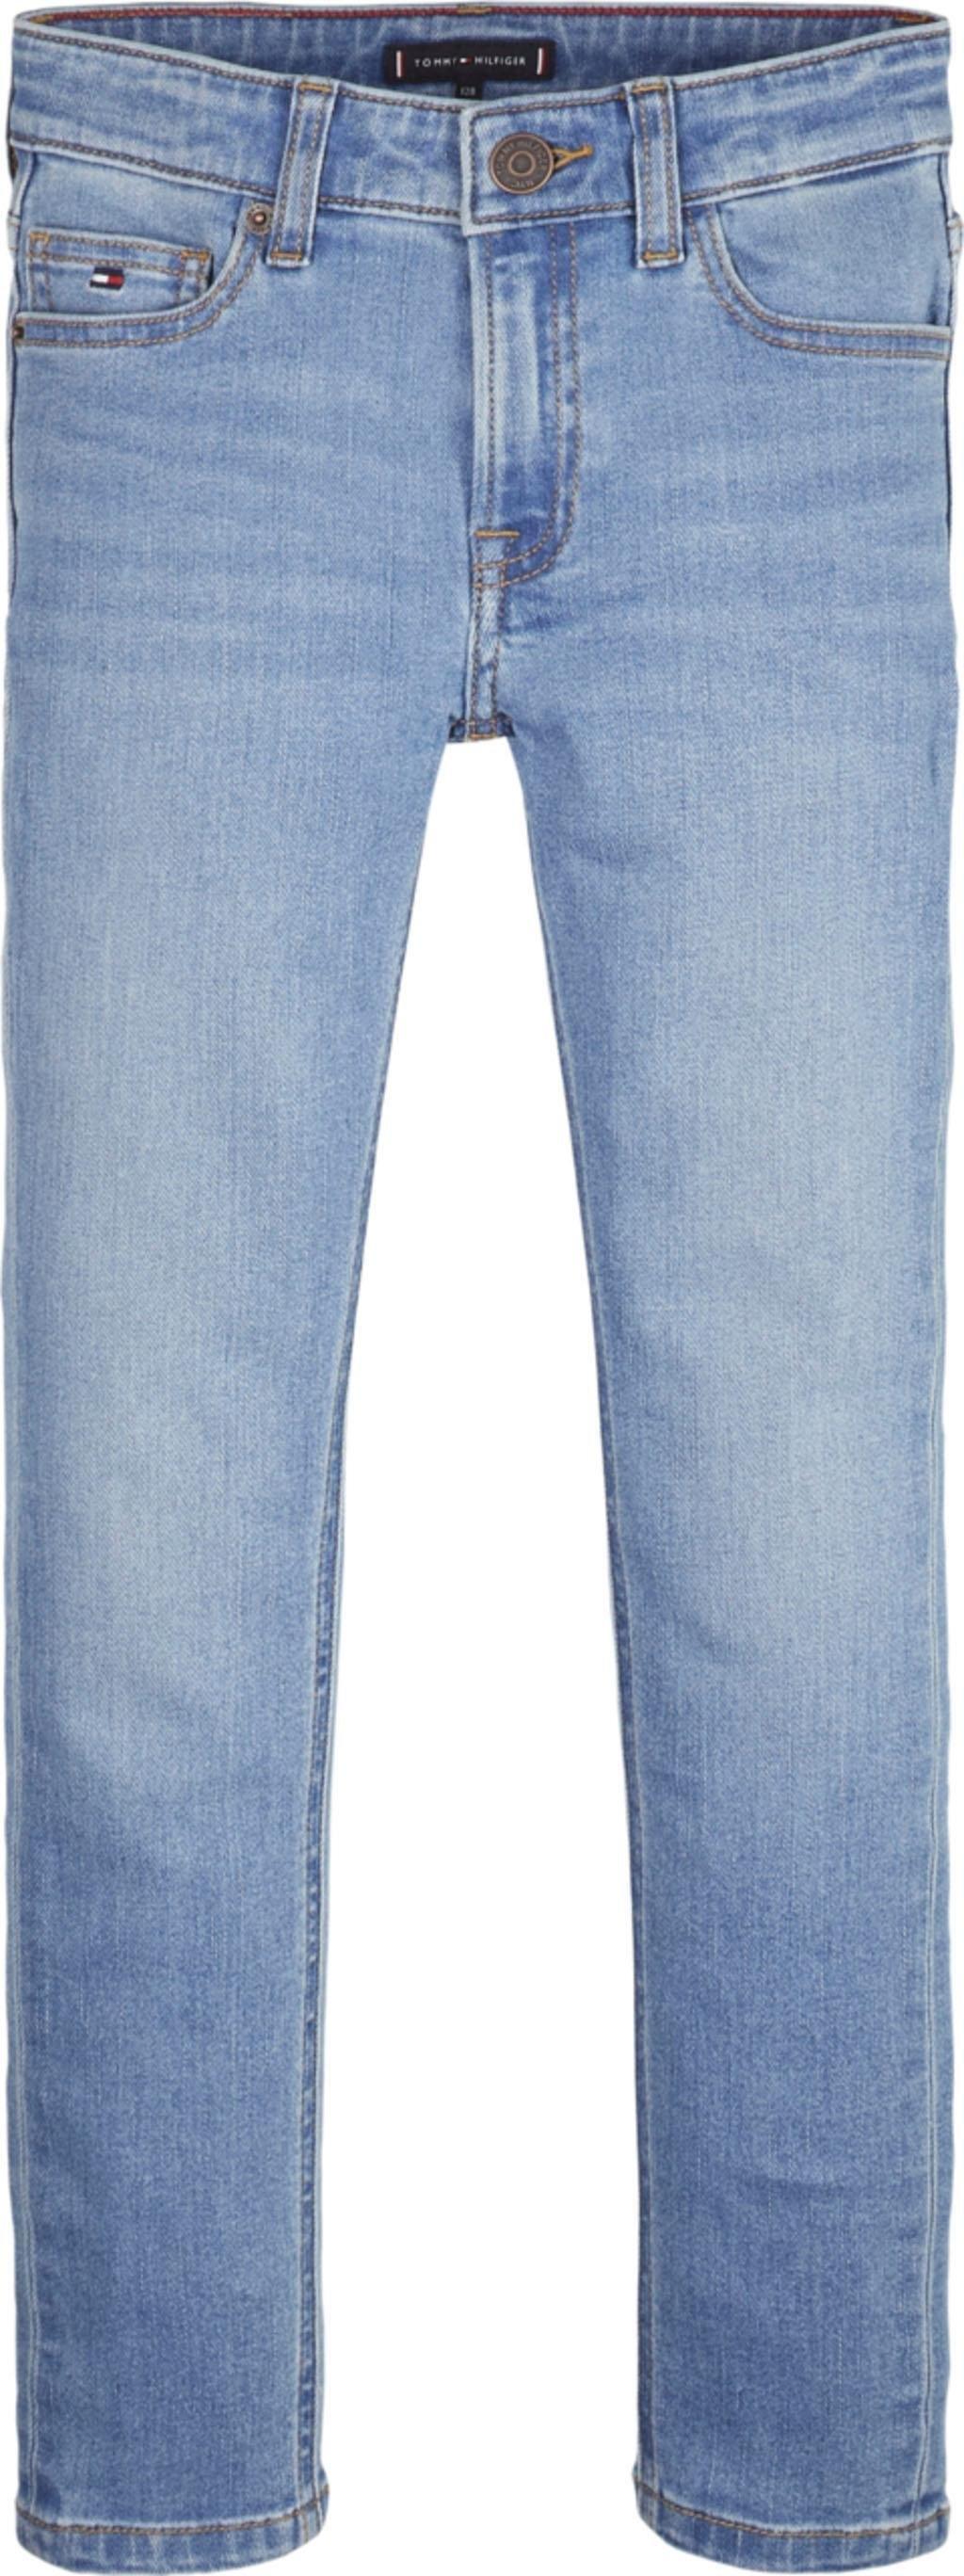 Tommy Hilfiger 5-pocket jeans bij OTTO online kopen